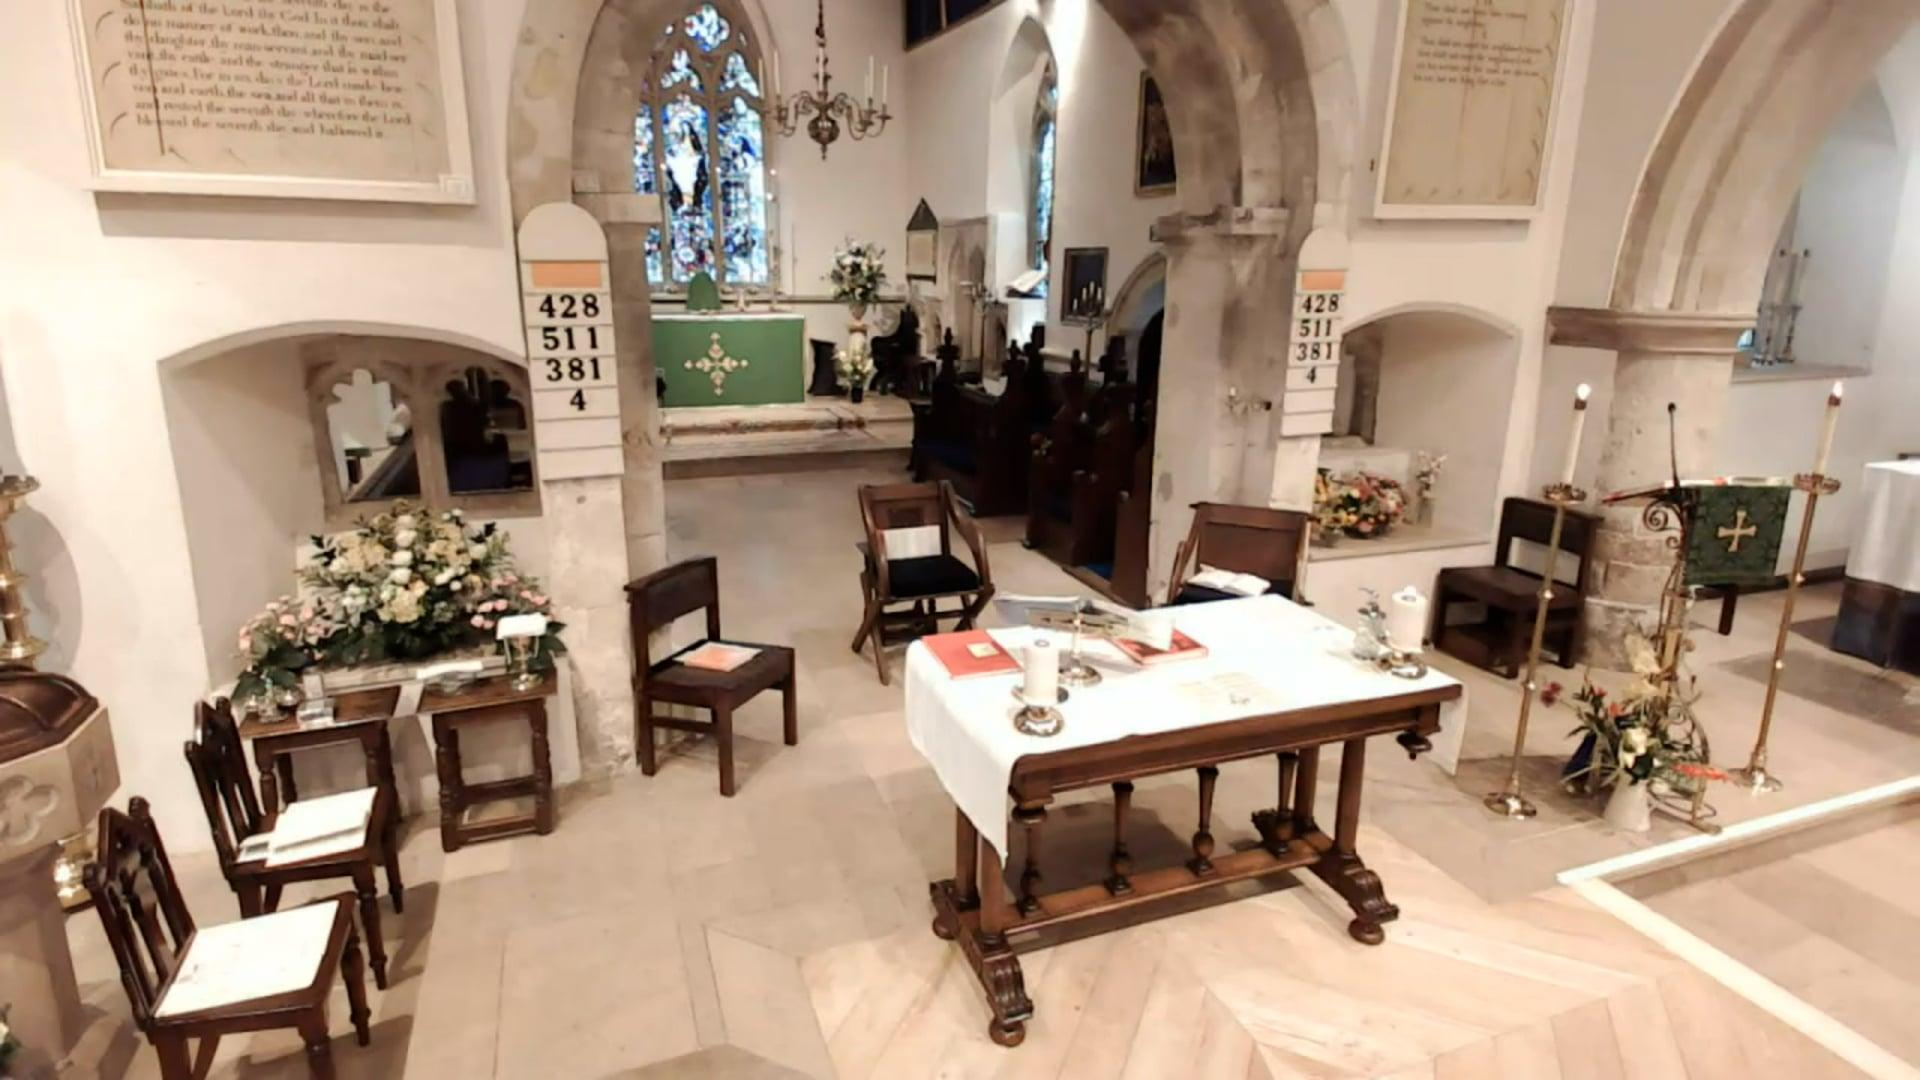 Sung Parish Eucharist - 5th September 2021